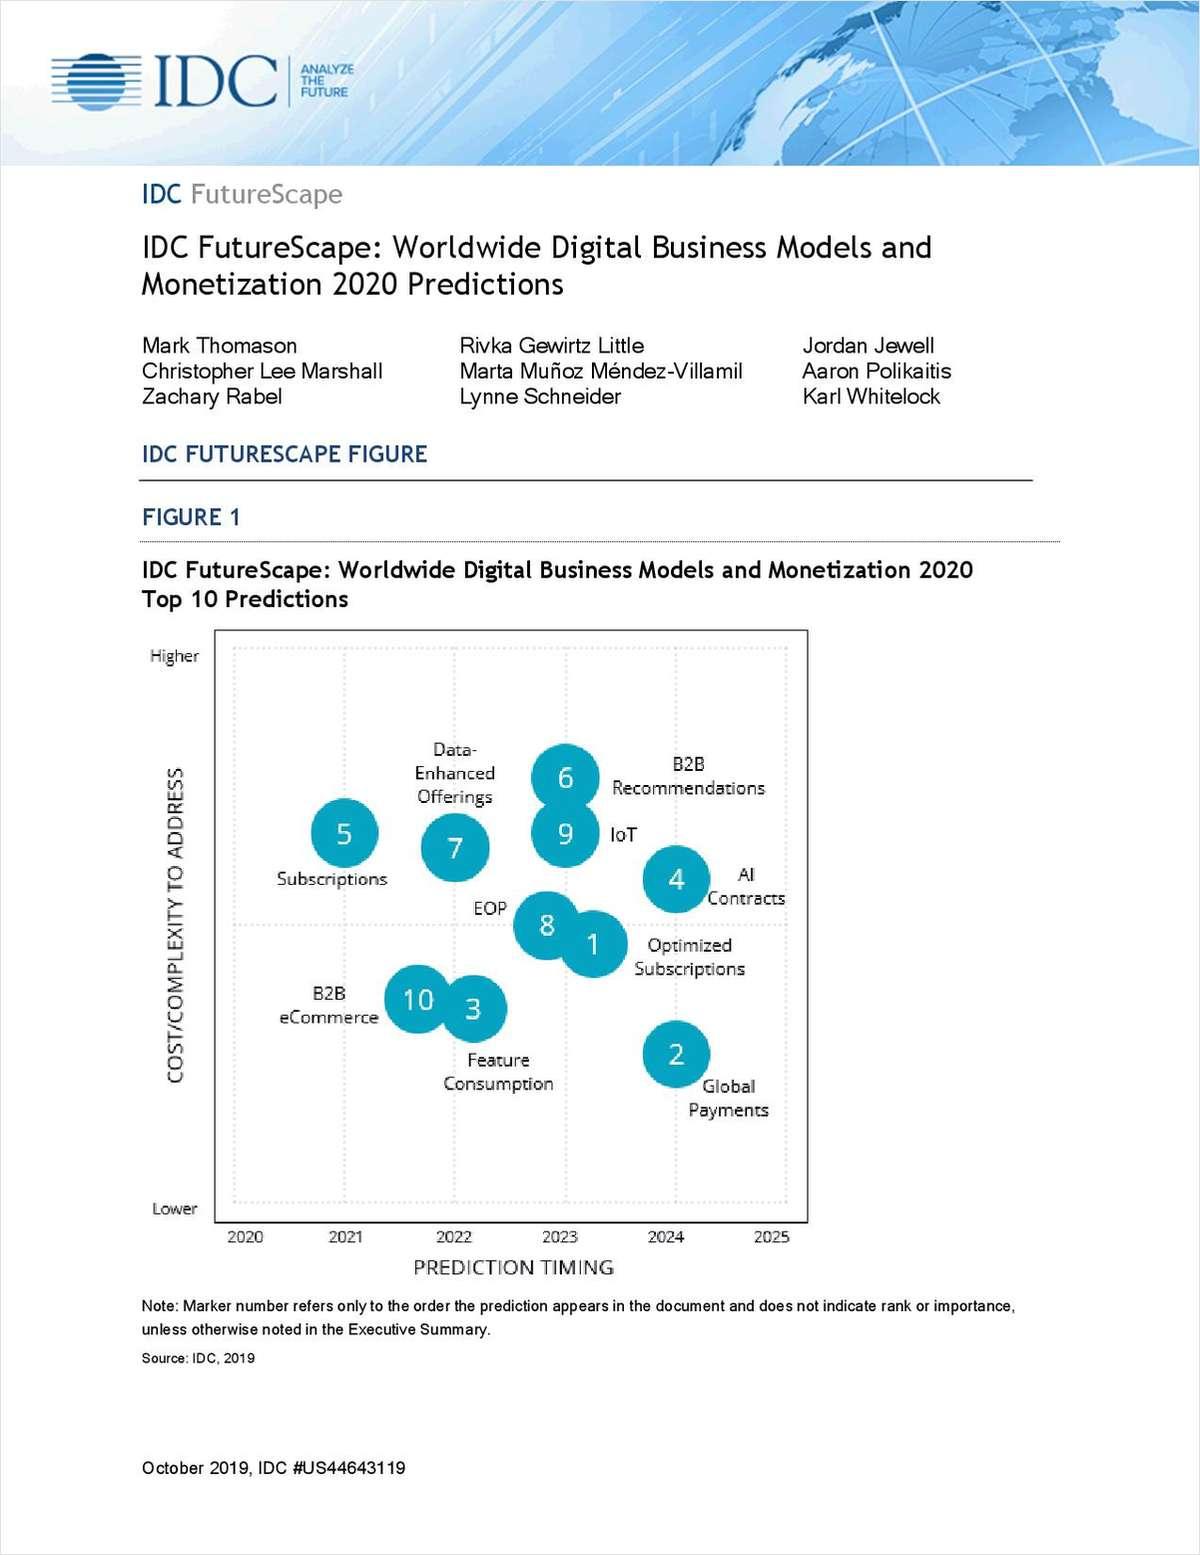 IDC: Worldwide Digital Business Models and Monetization 2020 Predictions